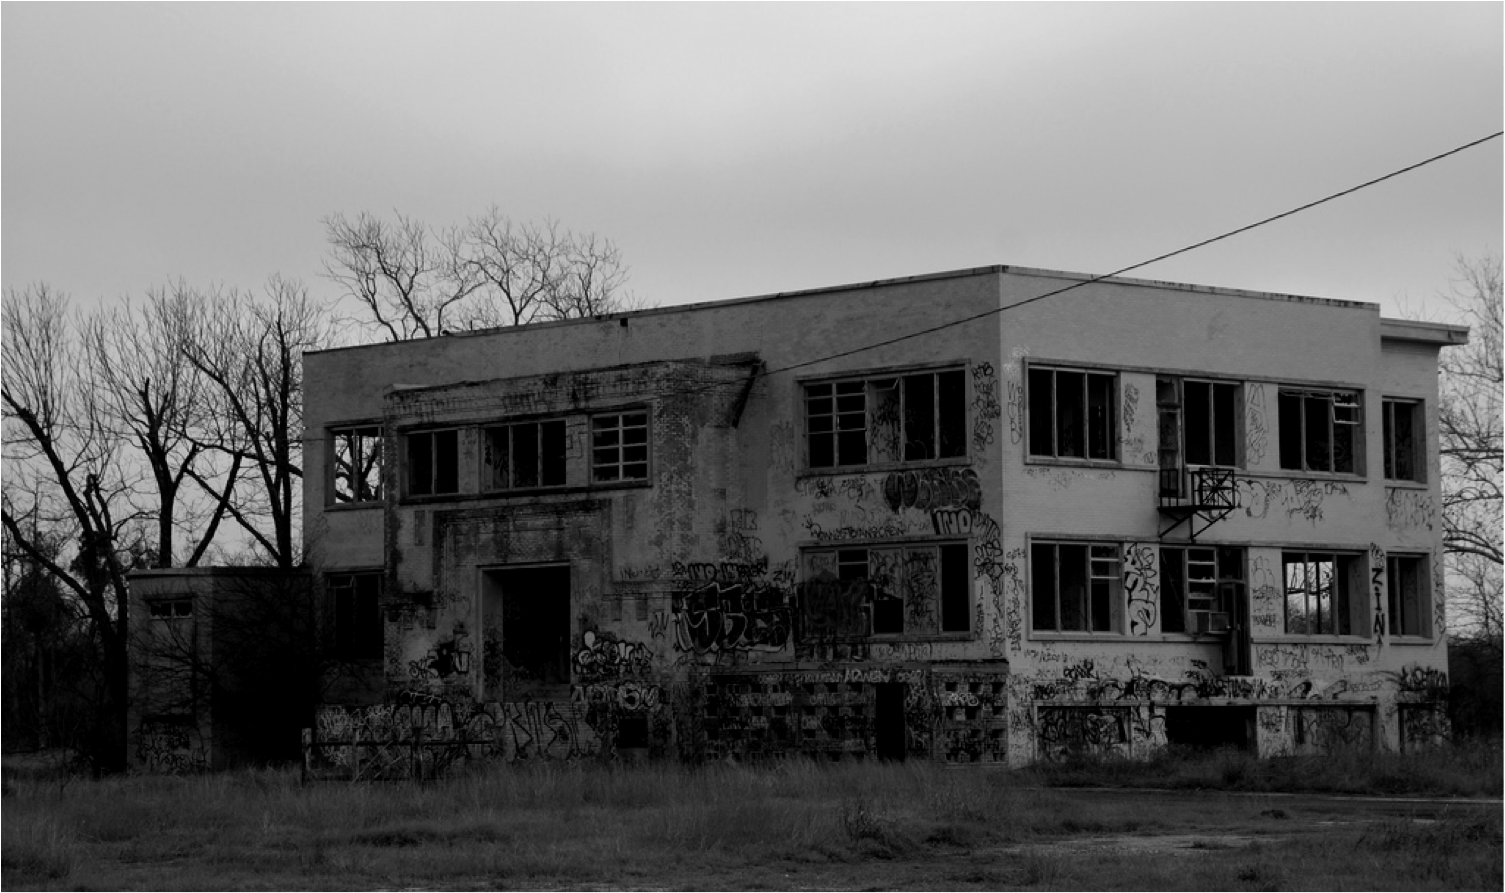 Abandoned Insane Asylums Infamous insane asylums II